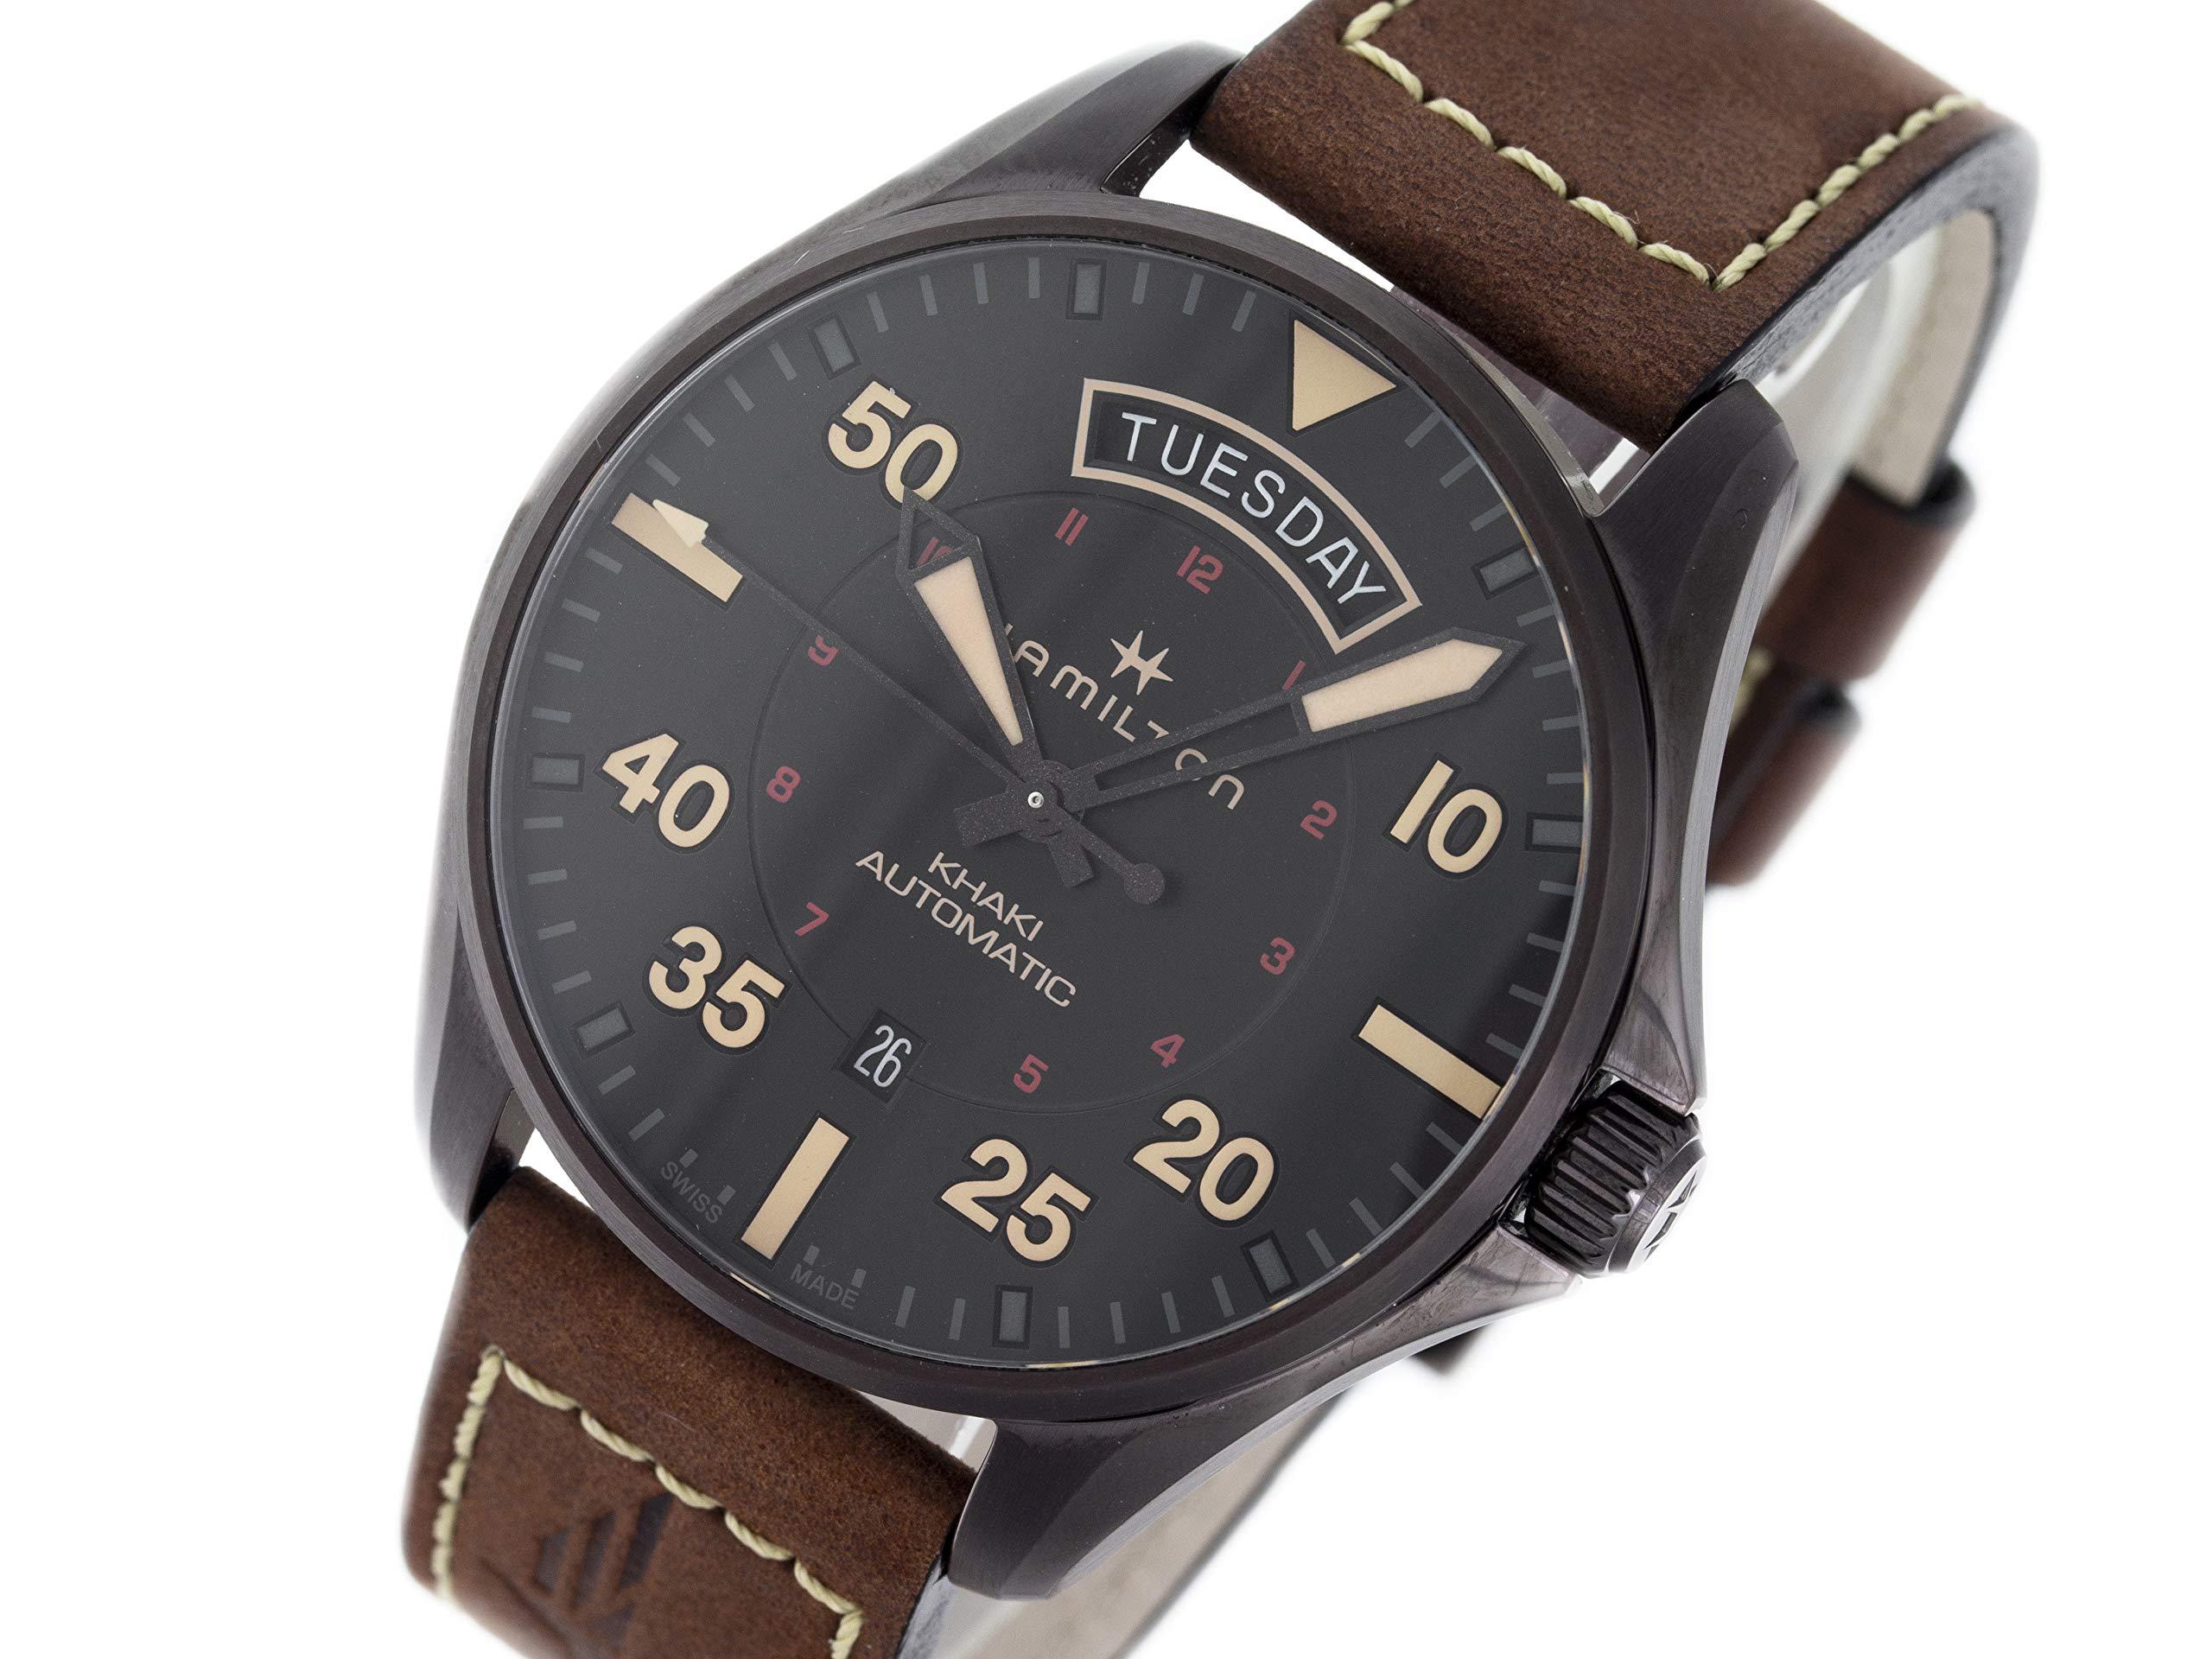 Hamilton Khaki Pilot Automatic-self-Wind Male Watch H64605531 (Certified Pre-Owned)